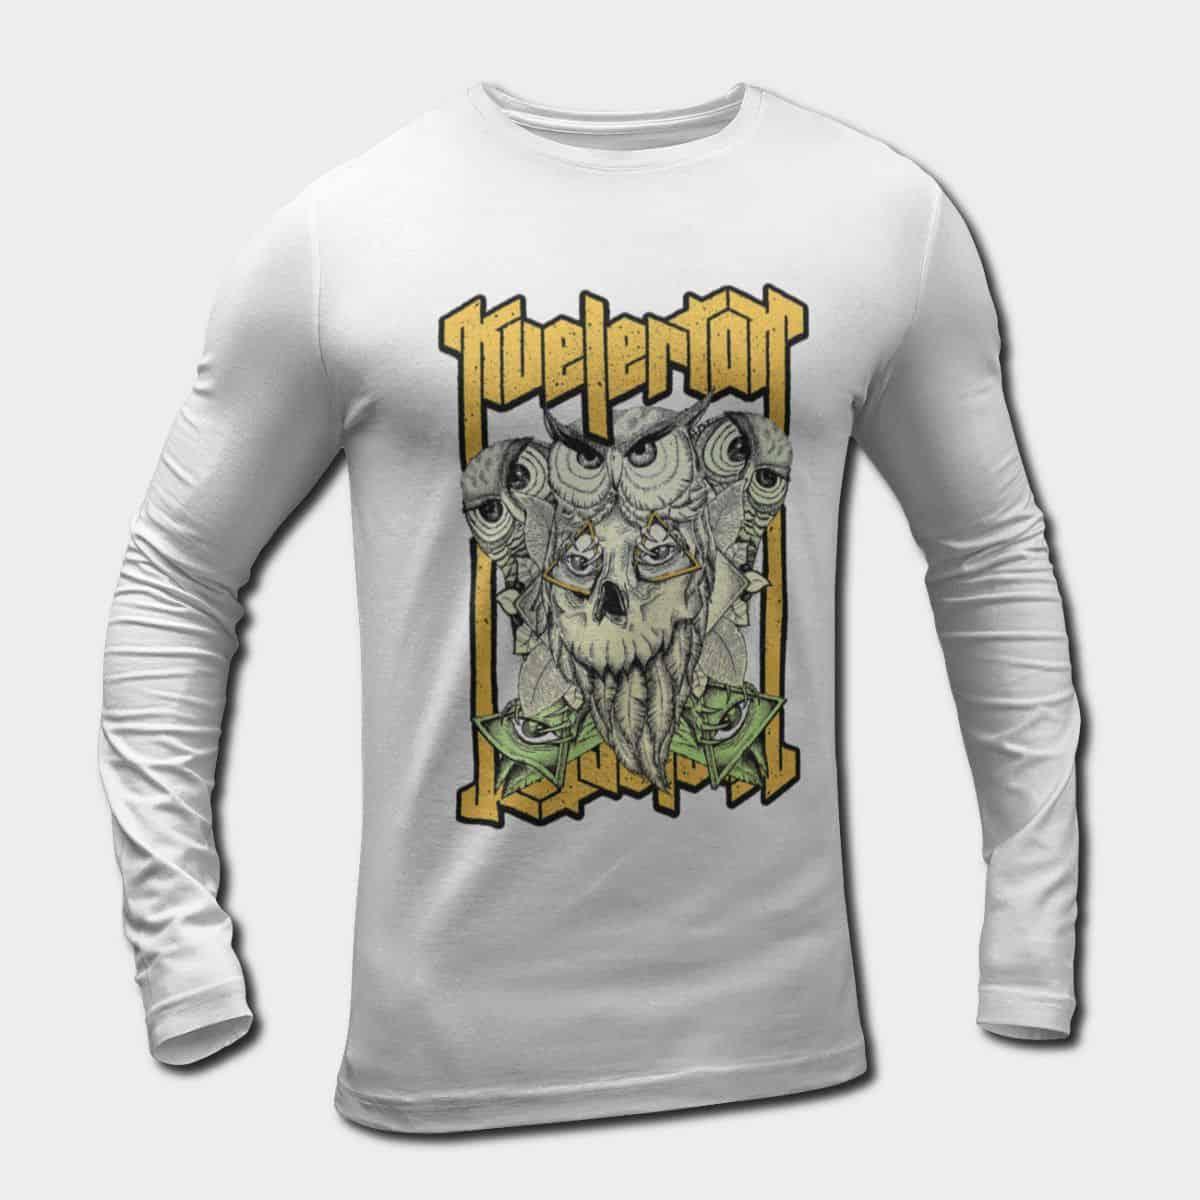 Longsleeve Long Sleeve T Kvelertak Artwork ShirtOwl Band QCsdthr